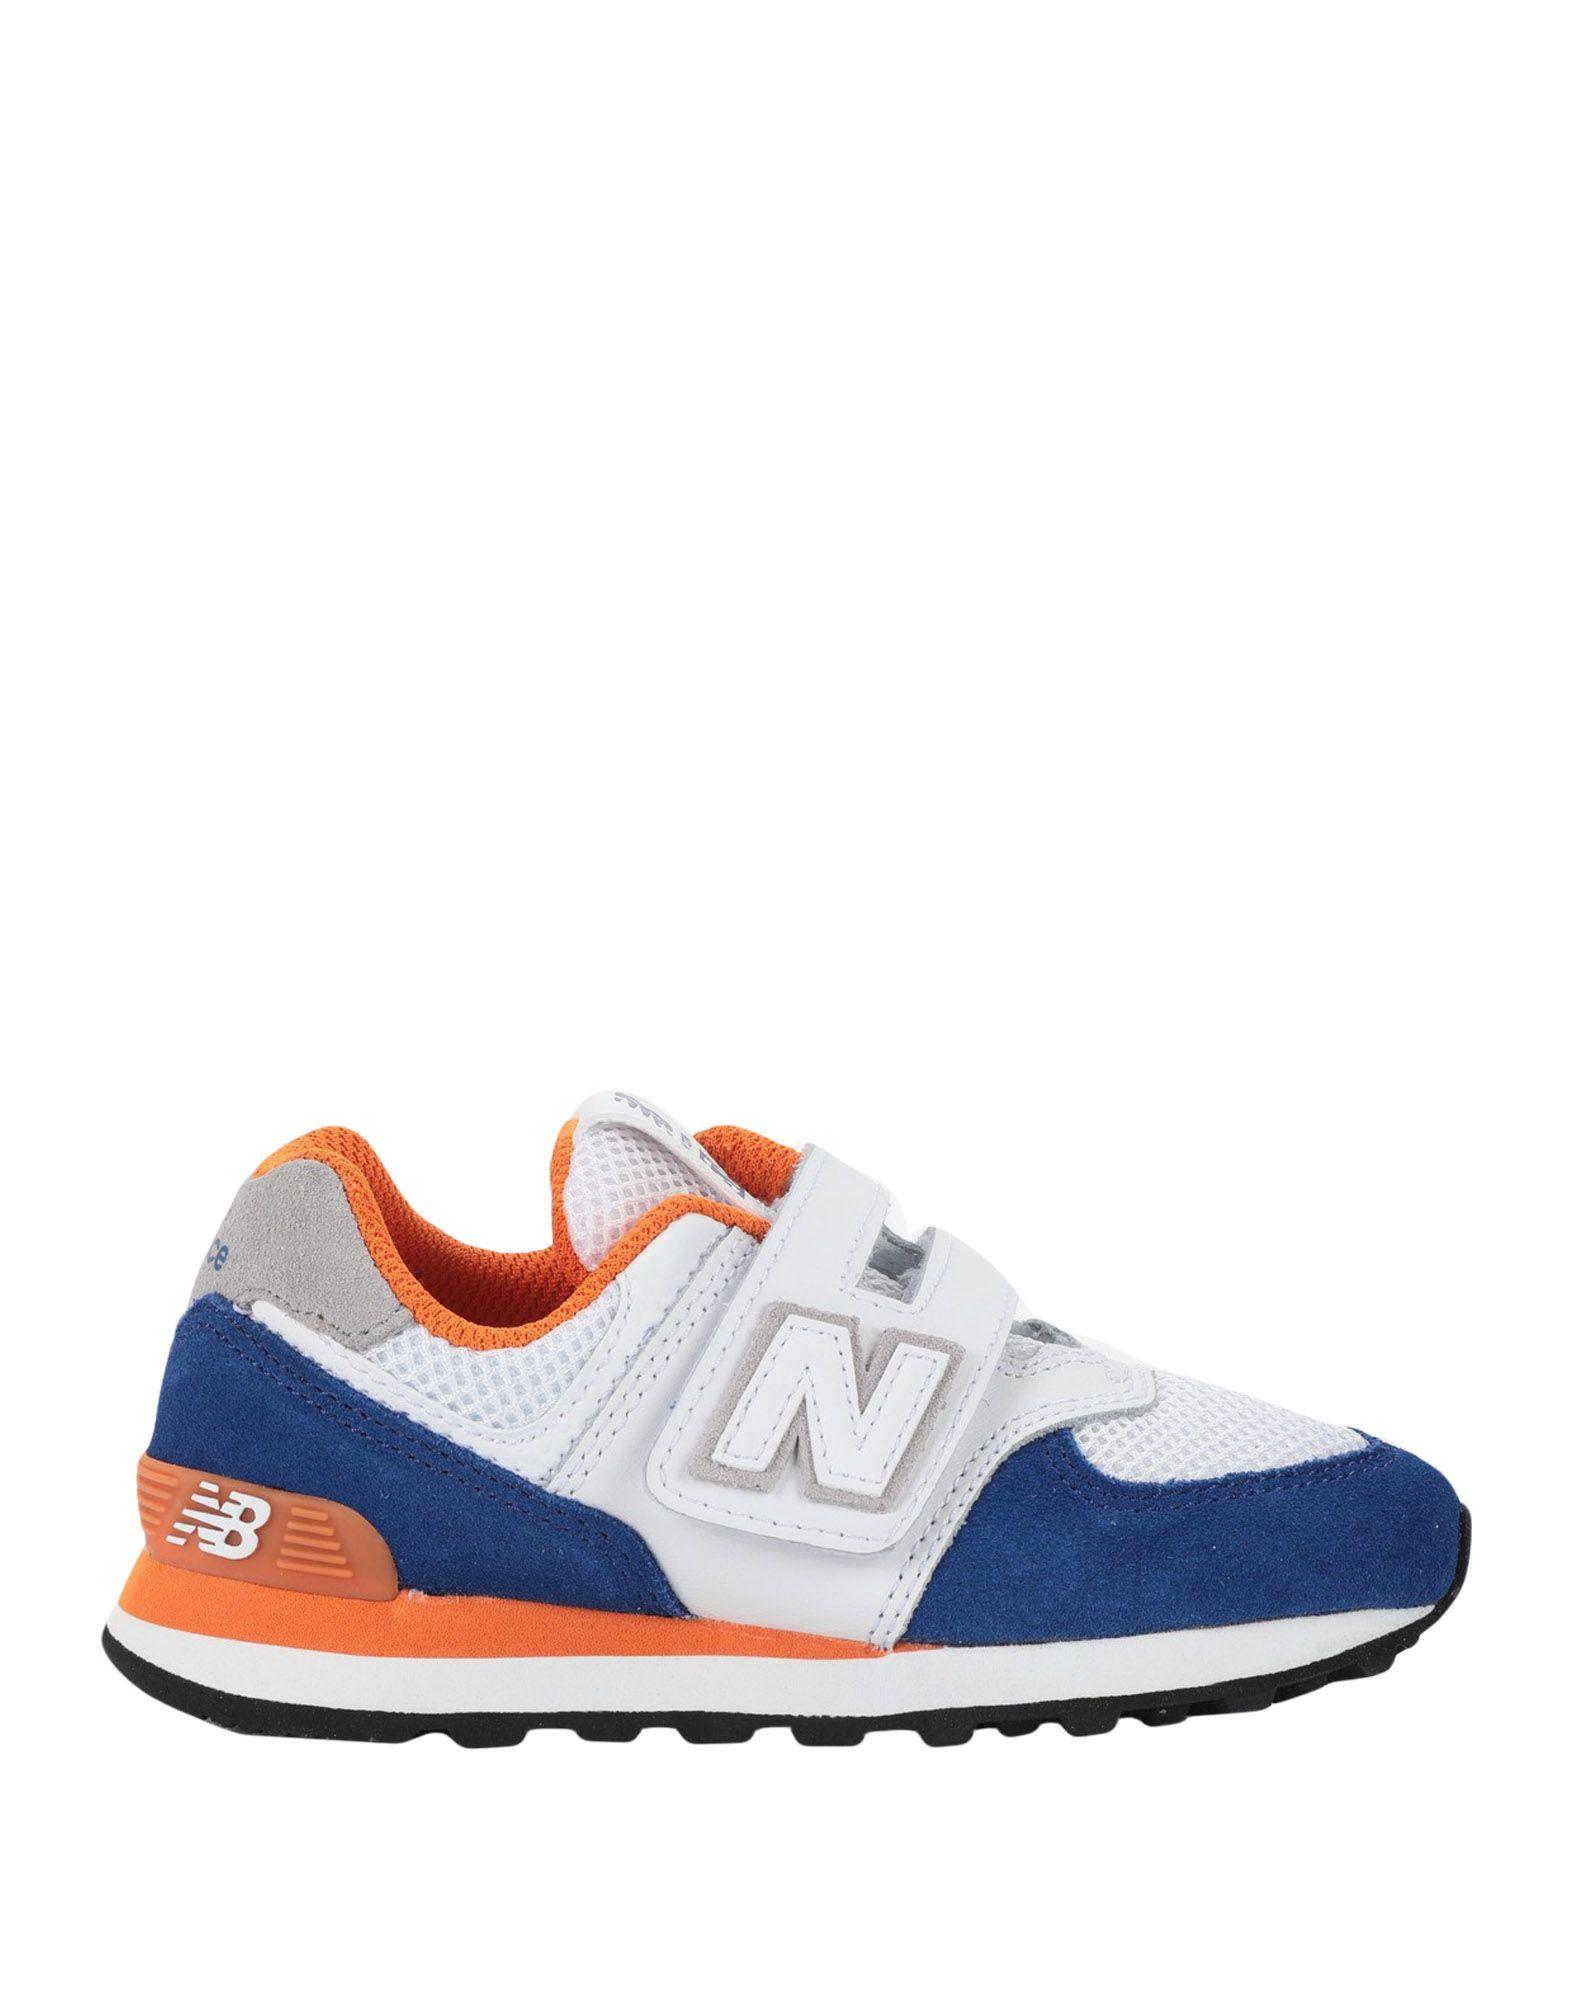 Zapatillas New Balance YV500EA azul niño New Balance